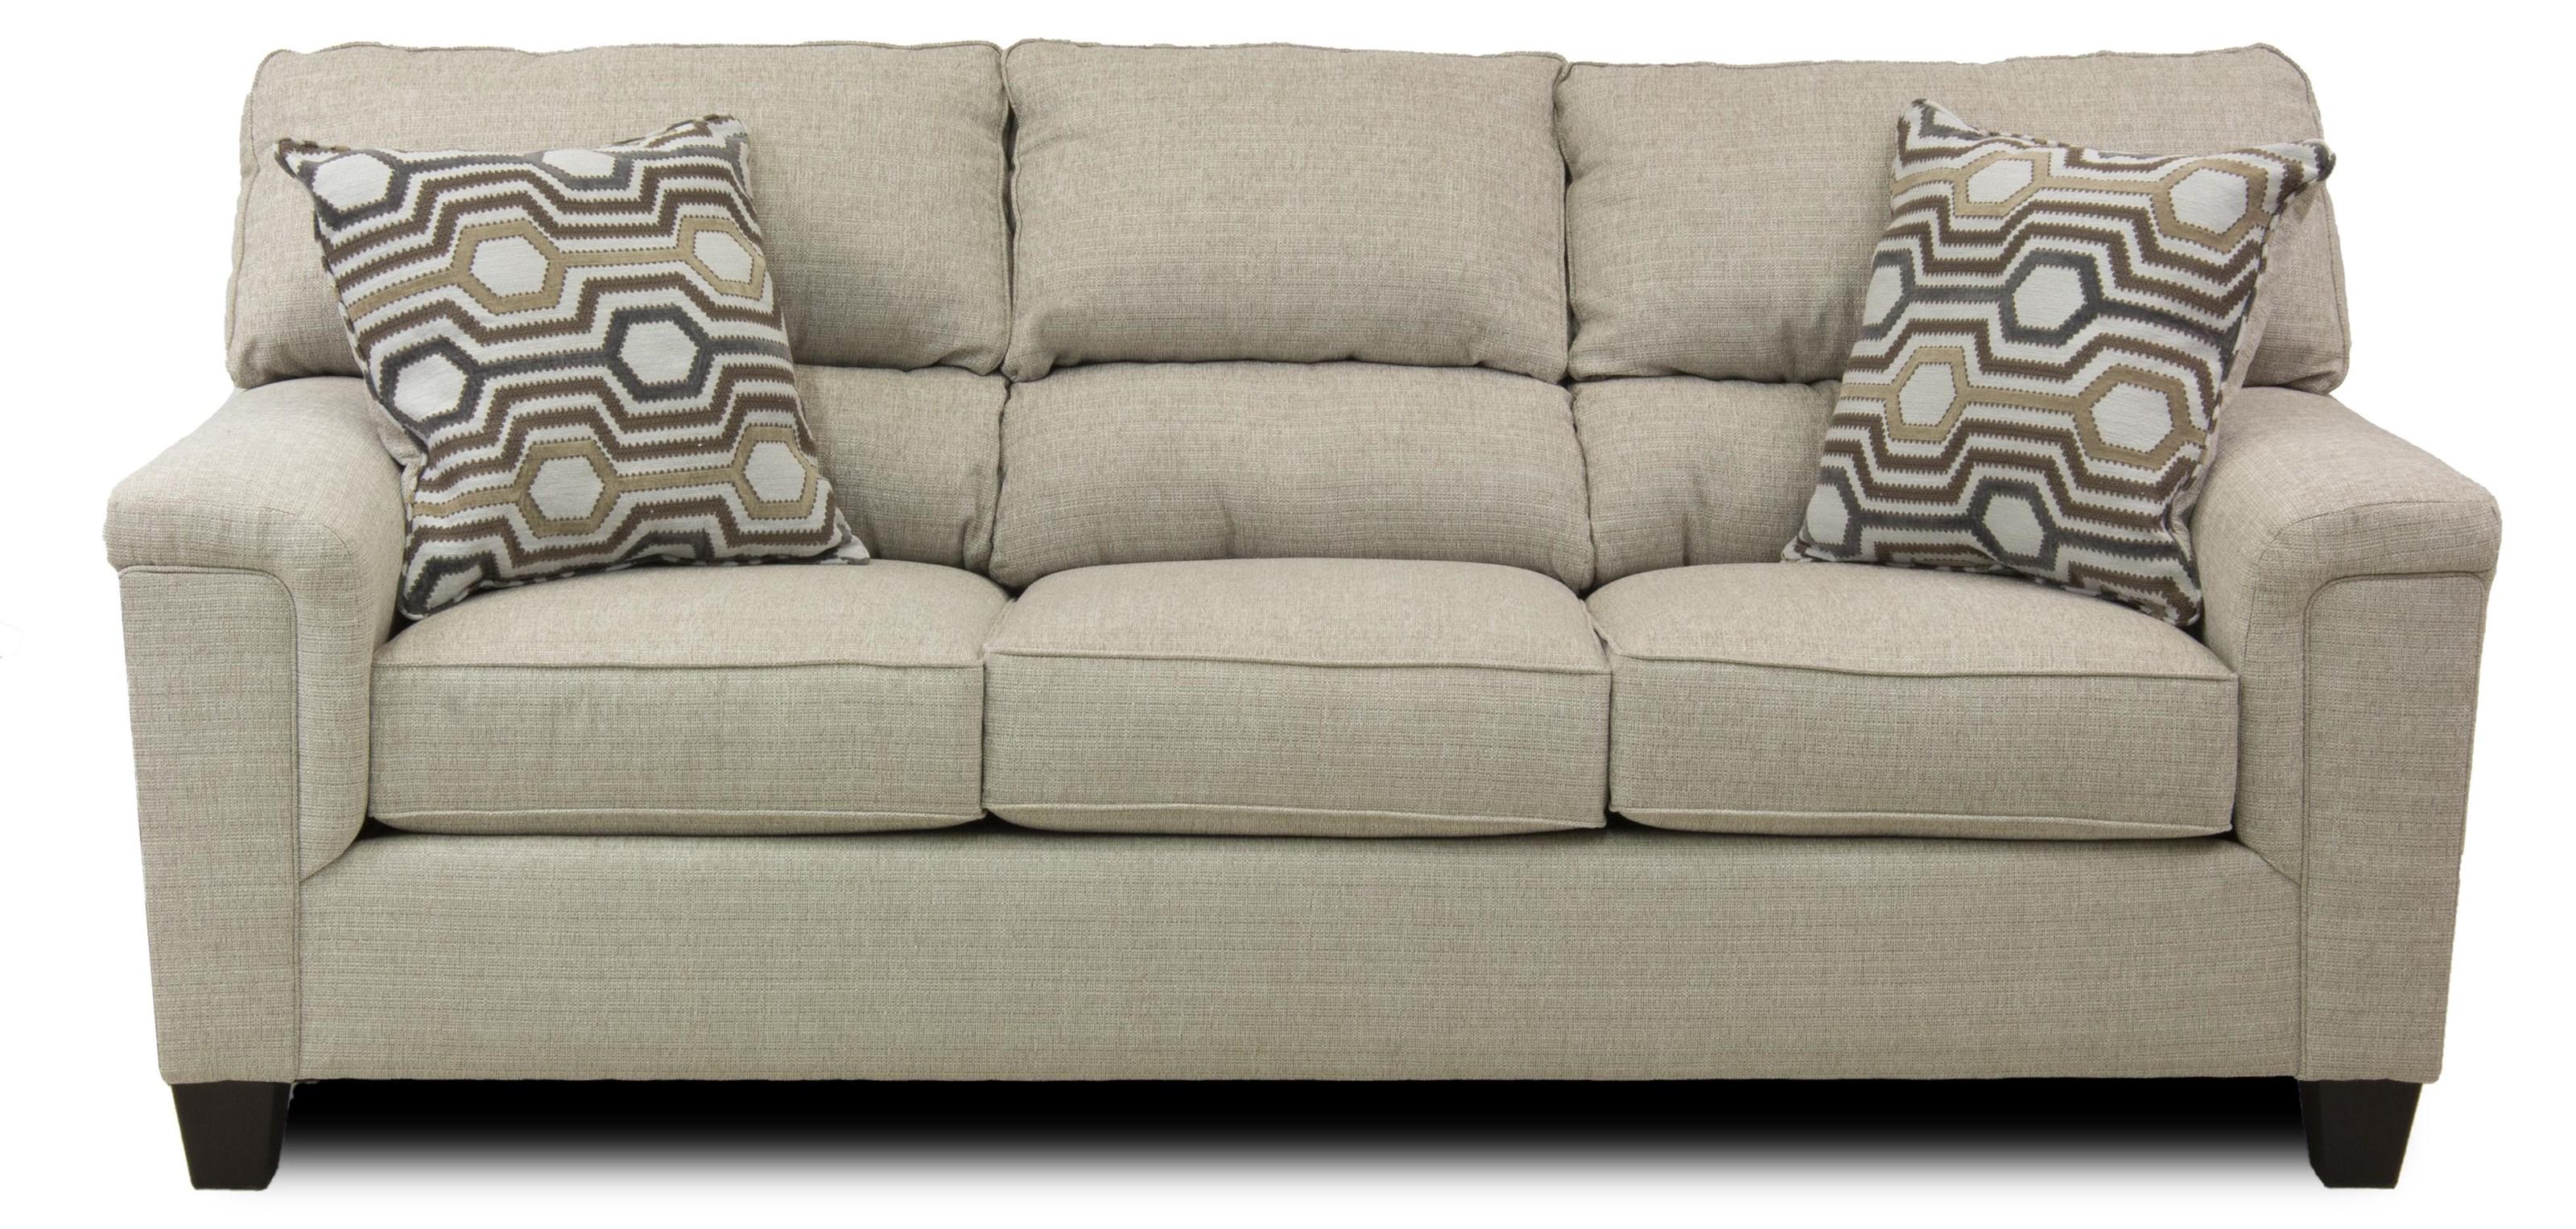 lane lawton sofa ruby gordon home sofas. Black Bedroom Furniture Sets. Home Design Ideas